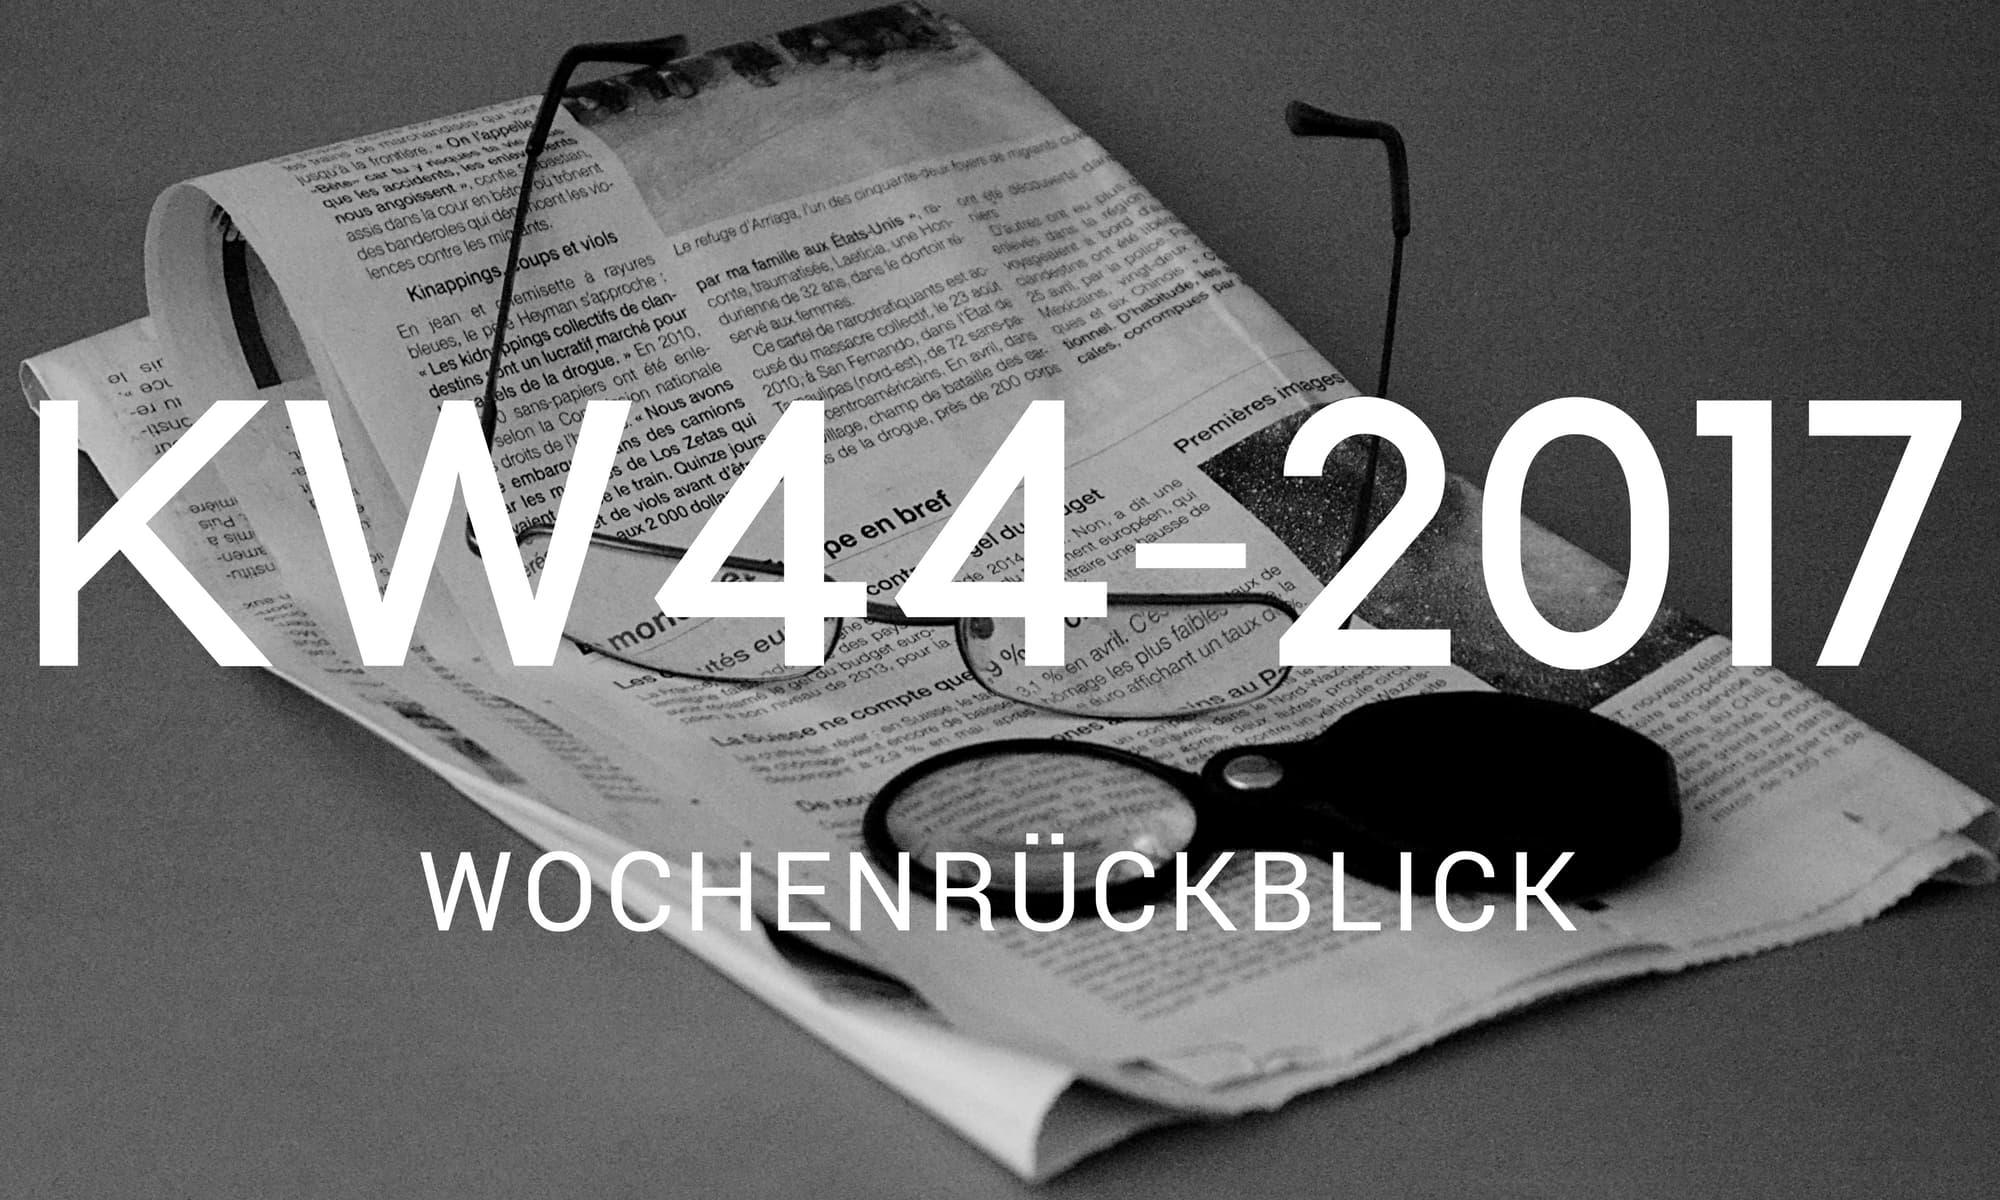 wochenrueckblick camping news KW44 2017